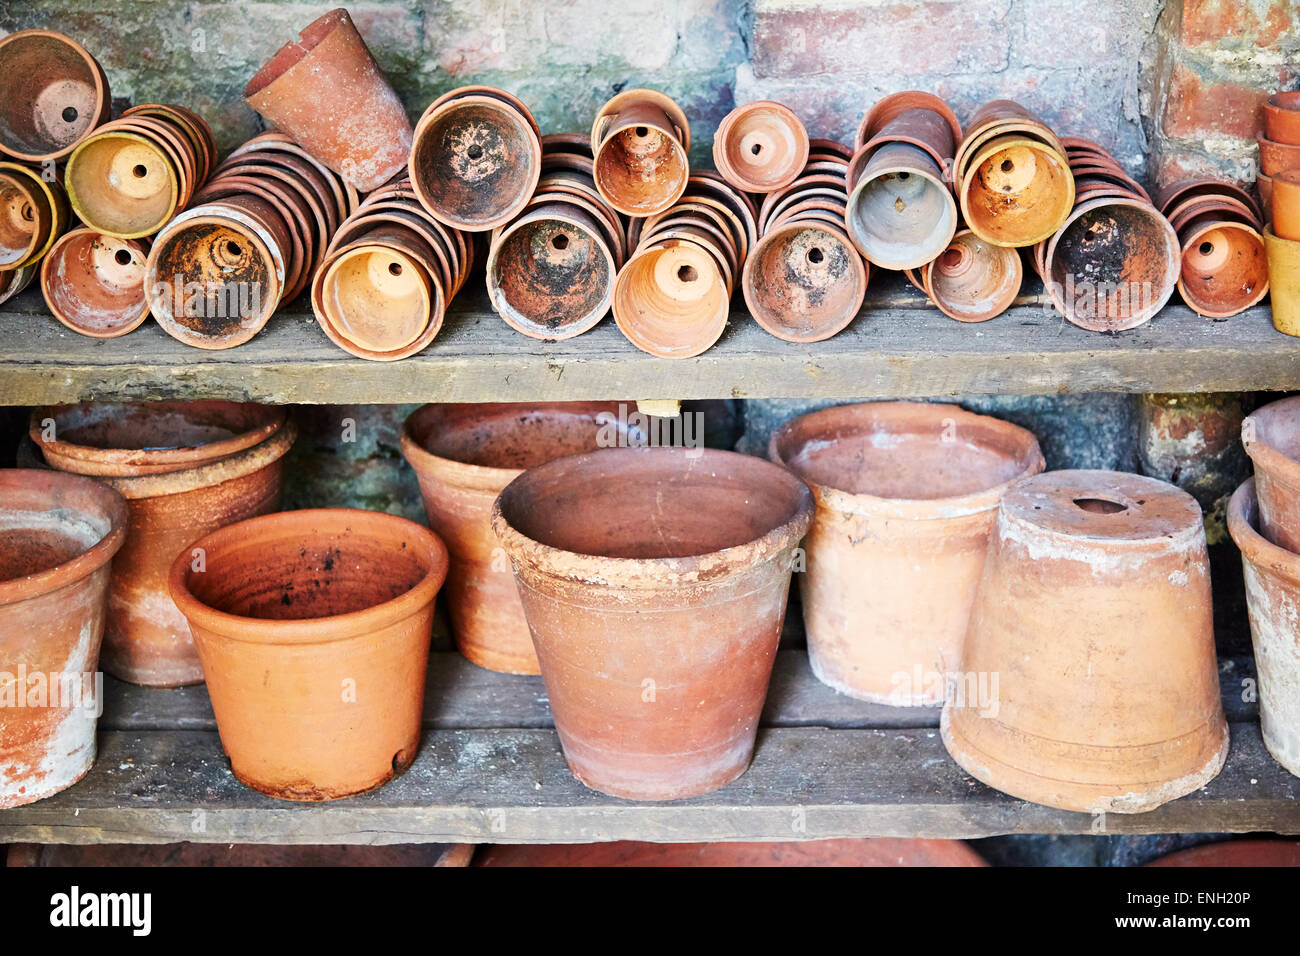 Selection of varying sizes of terracotta plant pots at Calke Abbey, Derbyshire, England, UK. - Stock Image